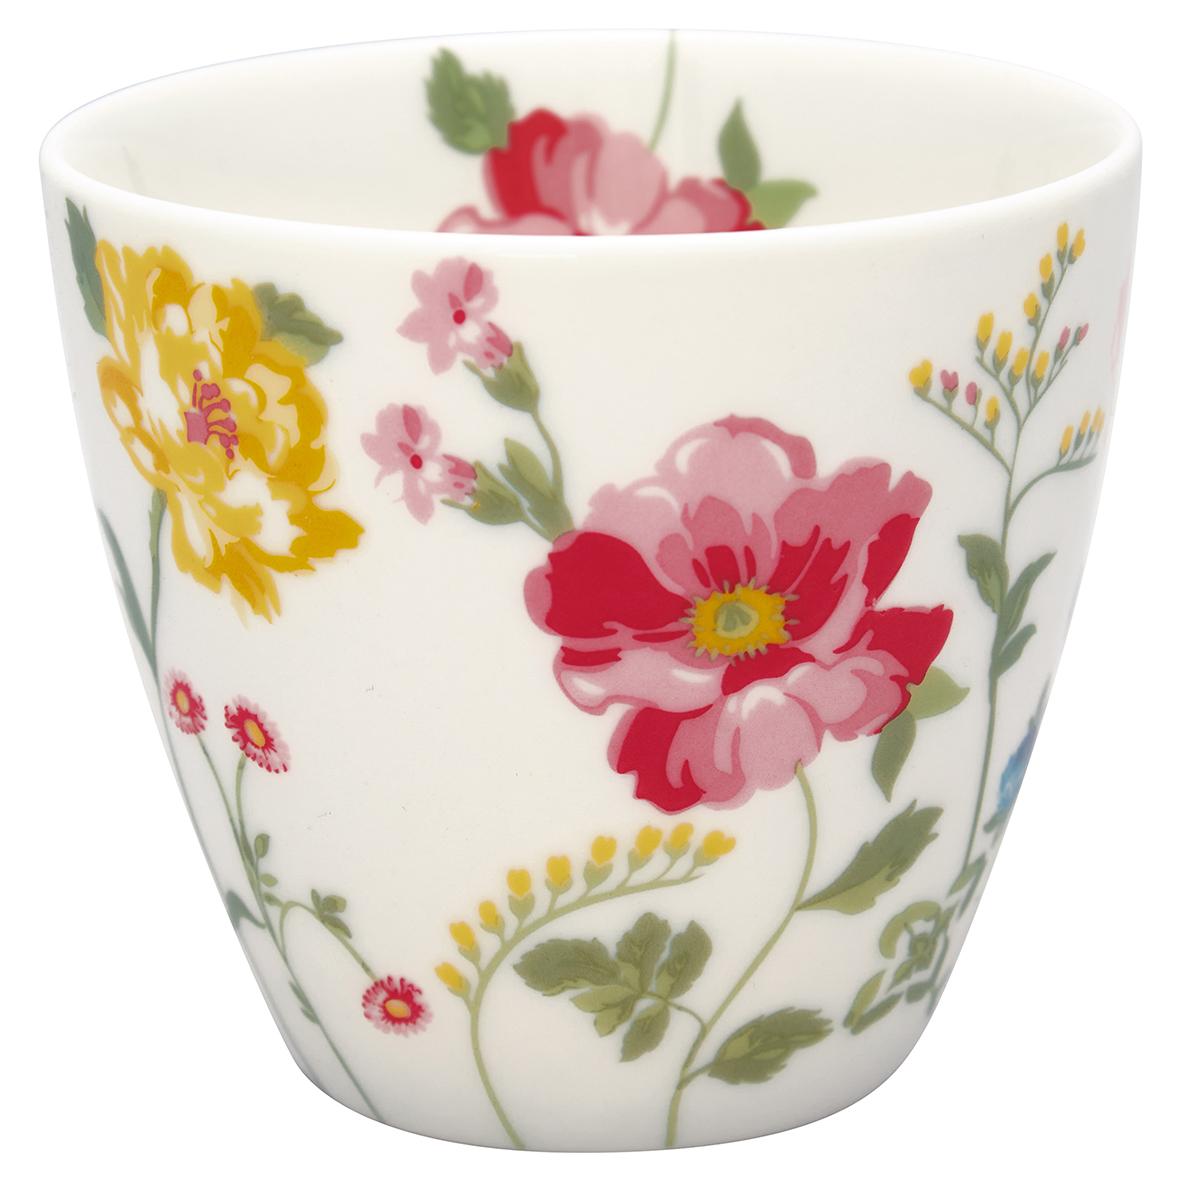 Greengate Lattecup Thilde white